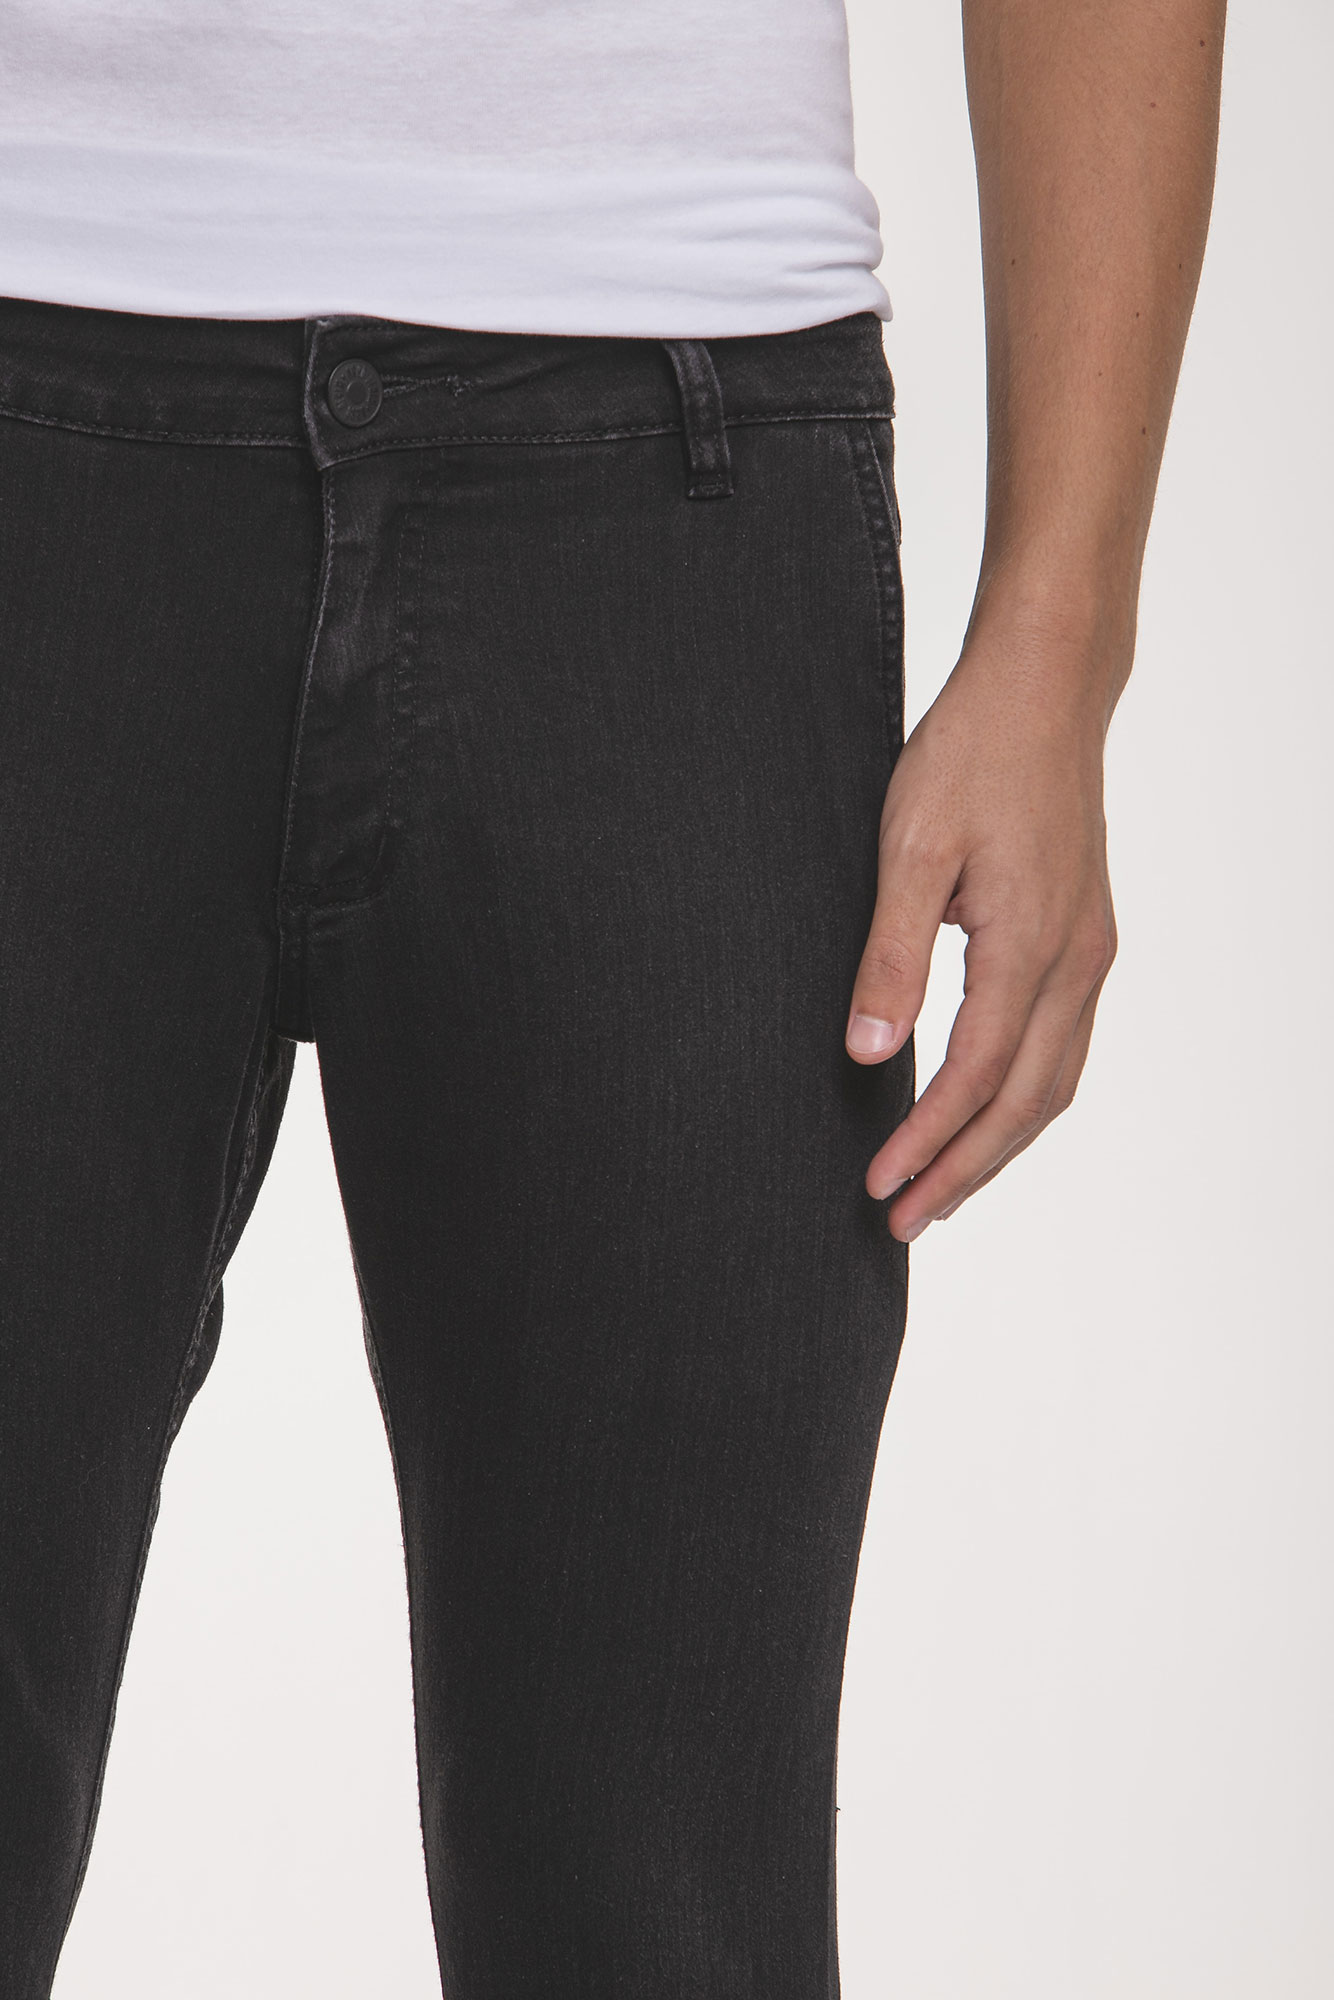 Calça Jeans Alfaiataria Black